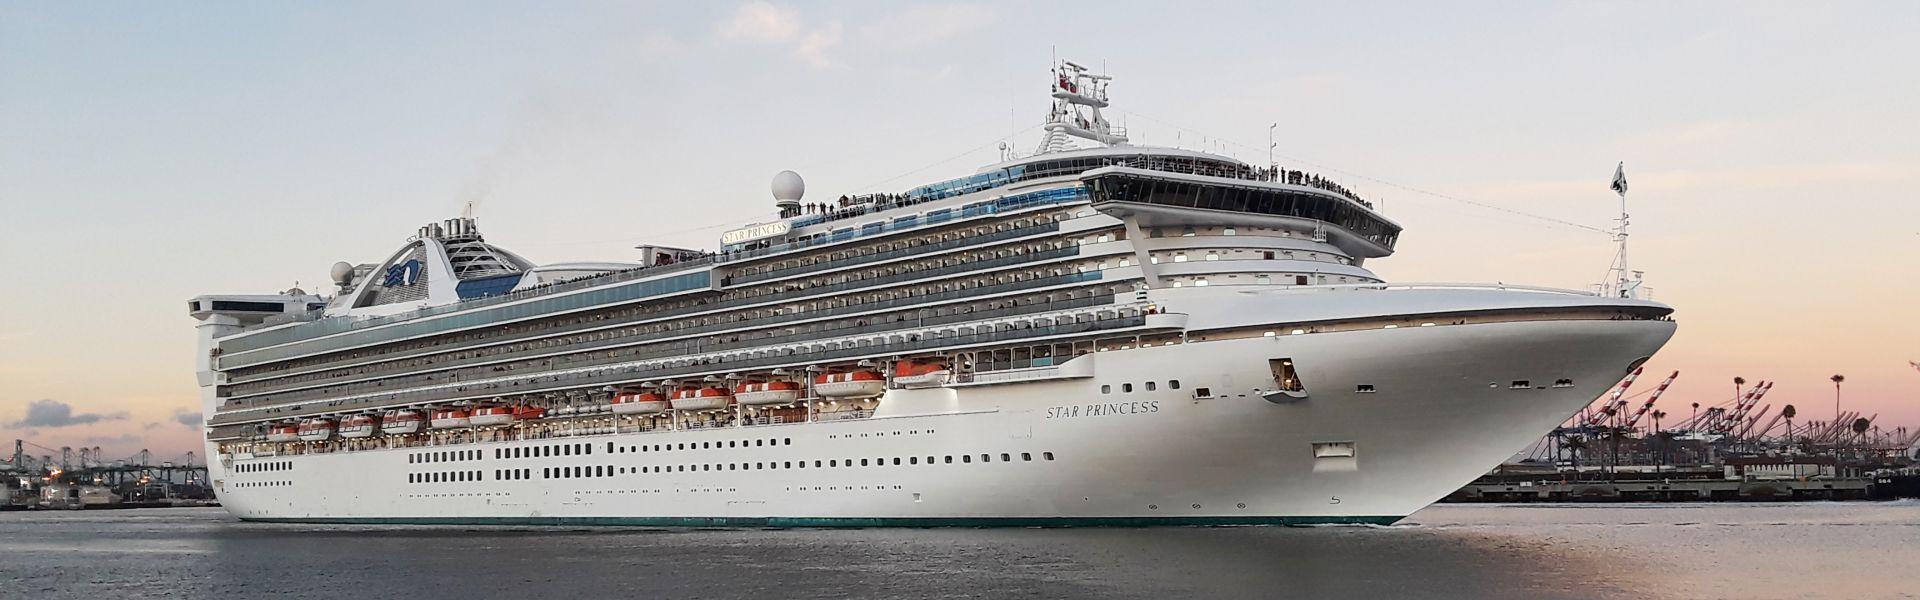 Croaziera 2018 - America de Sud (Los Angeles) - Princess Cruises - Star Princess - 16 nopti